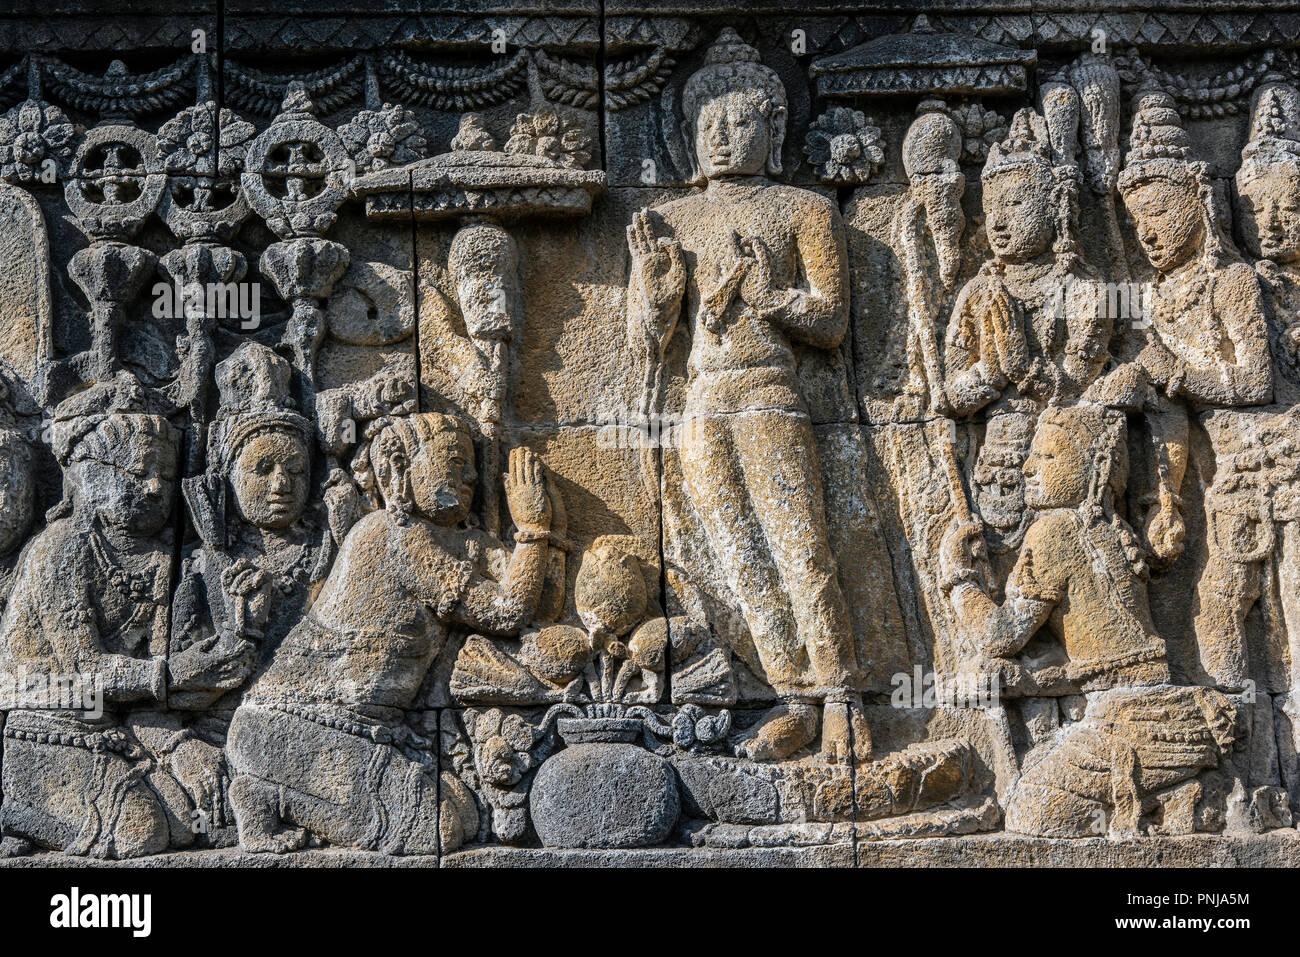 Detail of bas-relief sculptures, Candi Borobudur buddhist temple, Muntilan, Java, Indonesia - Stock Image